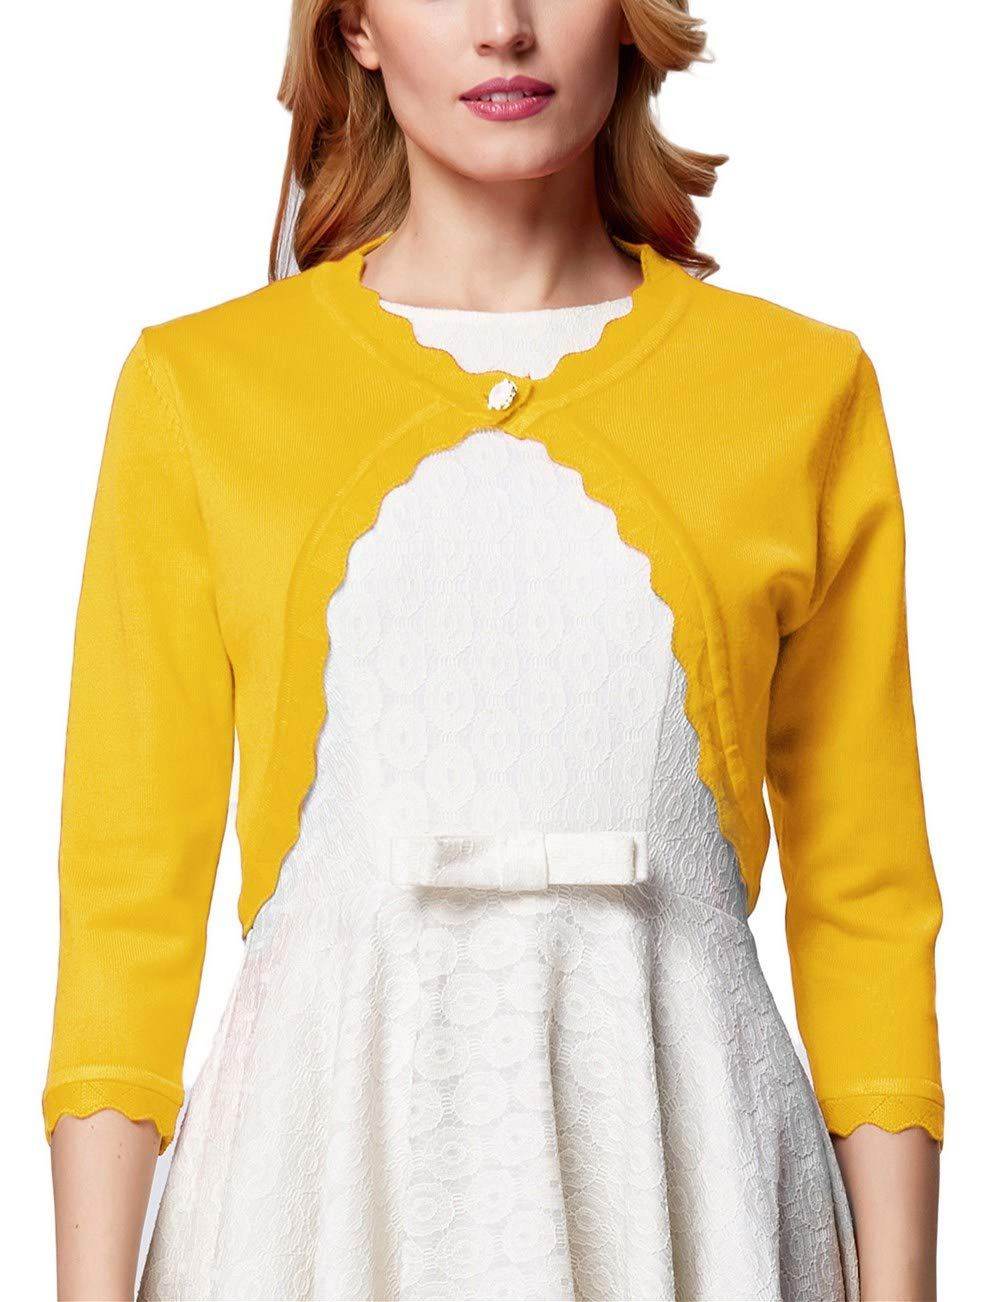 GRACE KARIN Womens Long Sleeve Open Front Knit Cropped Bolero Shrug Cardigan